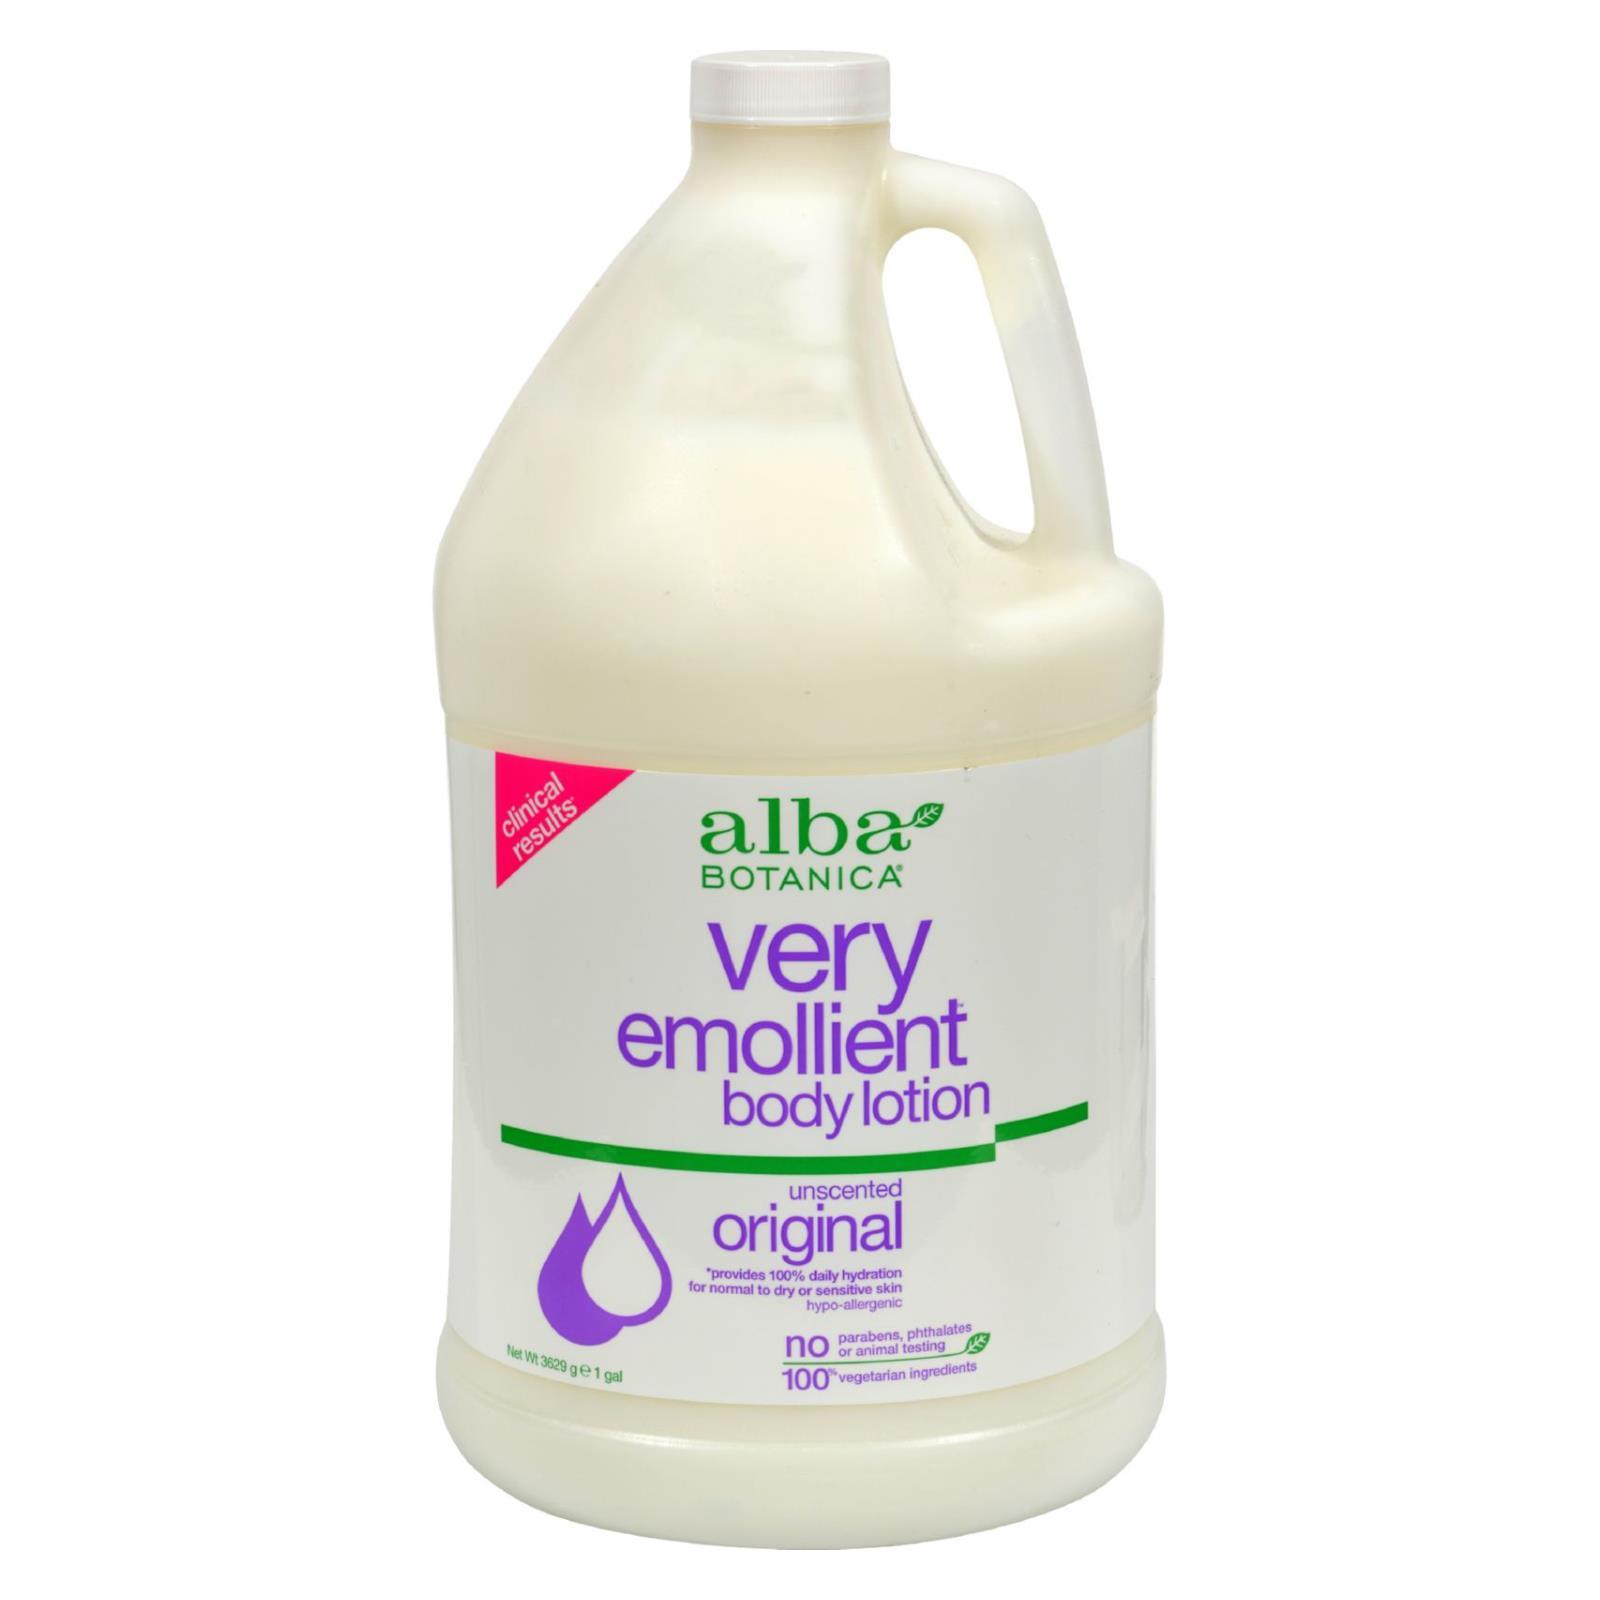 Alba Botanica - Very Emollient Body Lotion - Original Unscented - 1 Gallon